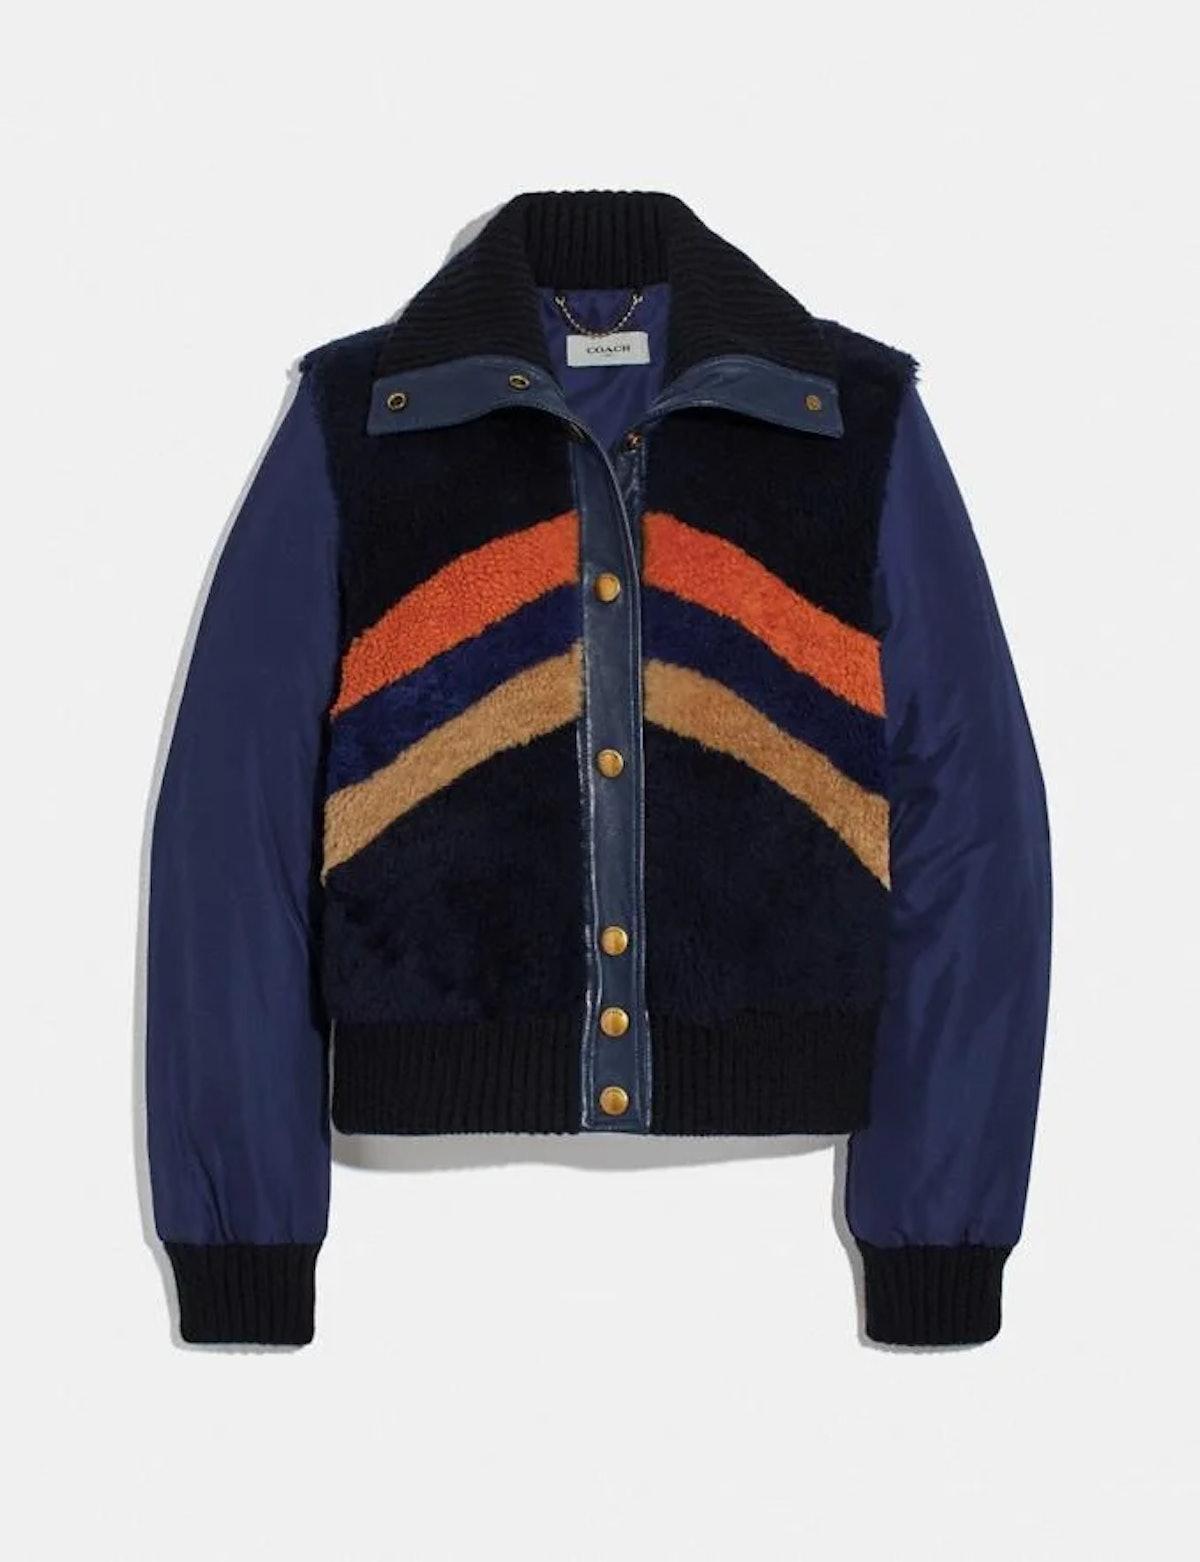 Retro Shearling Jacket